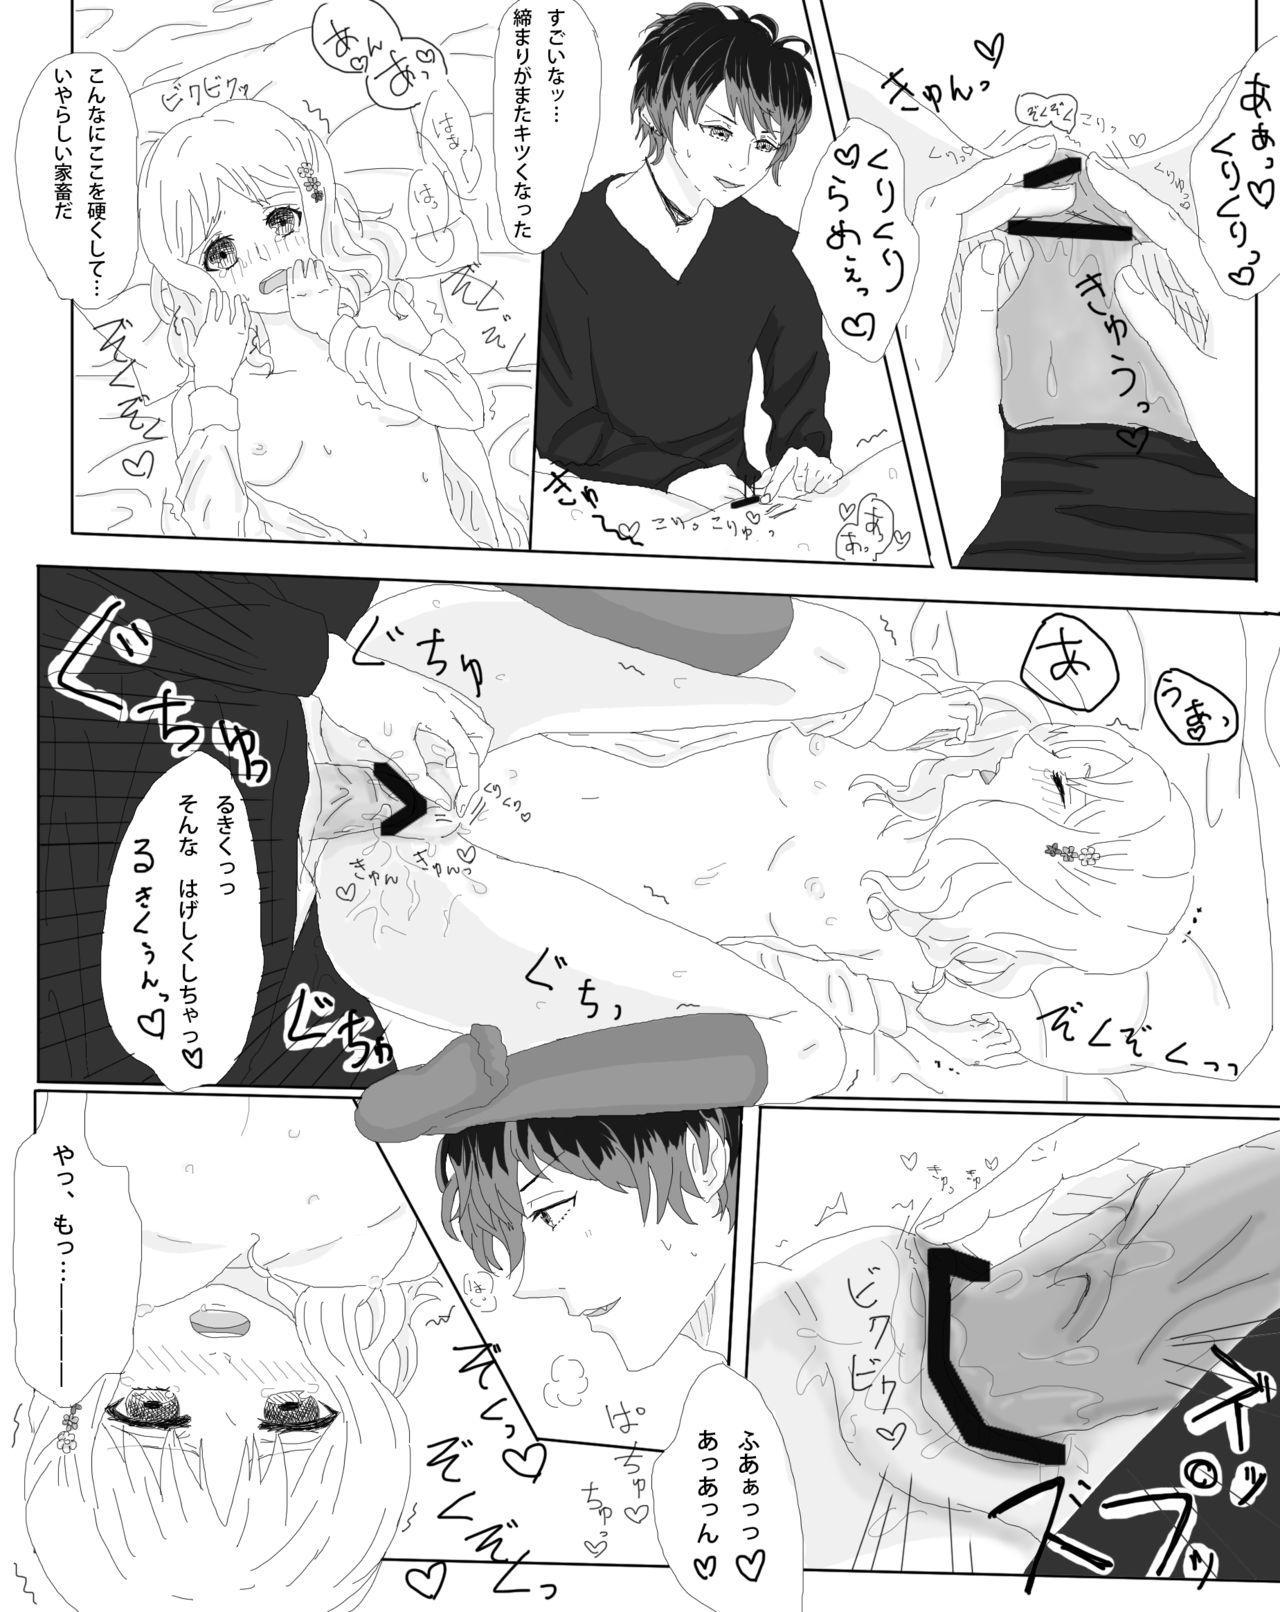 Rukiyui-chan no wo Midarana Manga 4